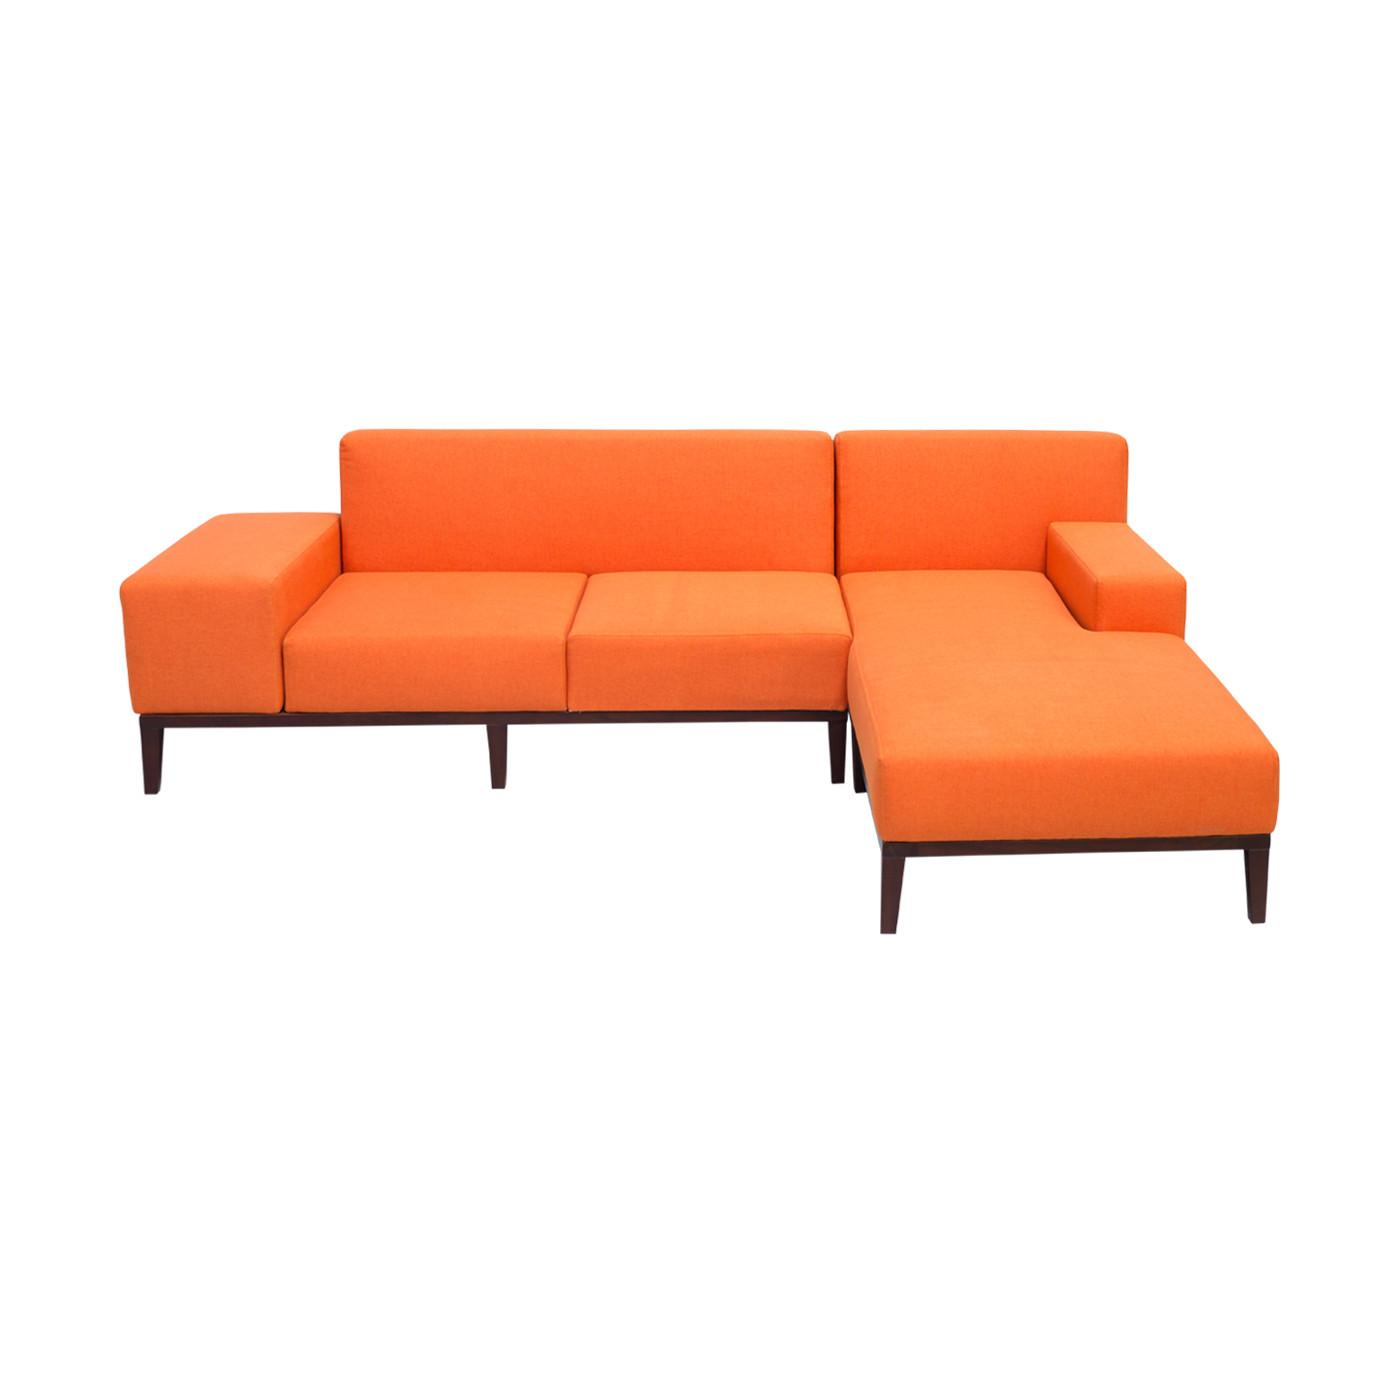 SoHo Orange Sofa